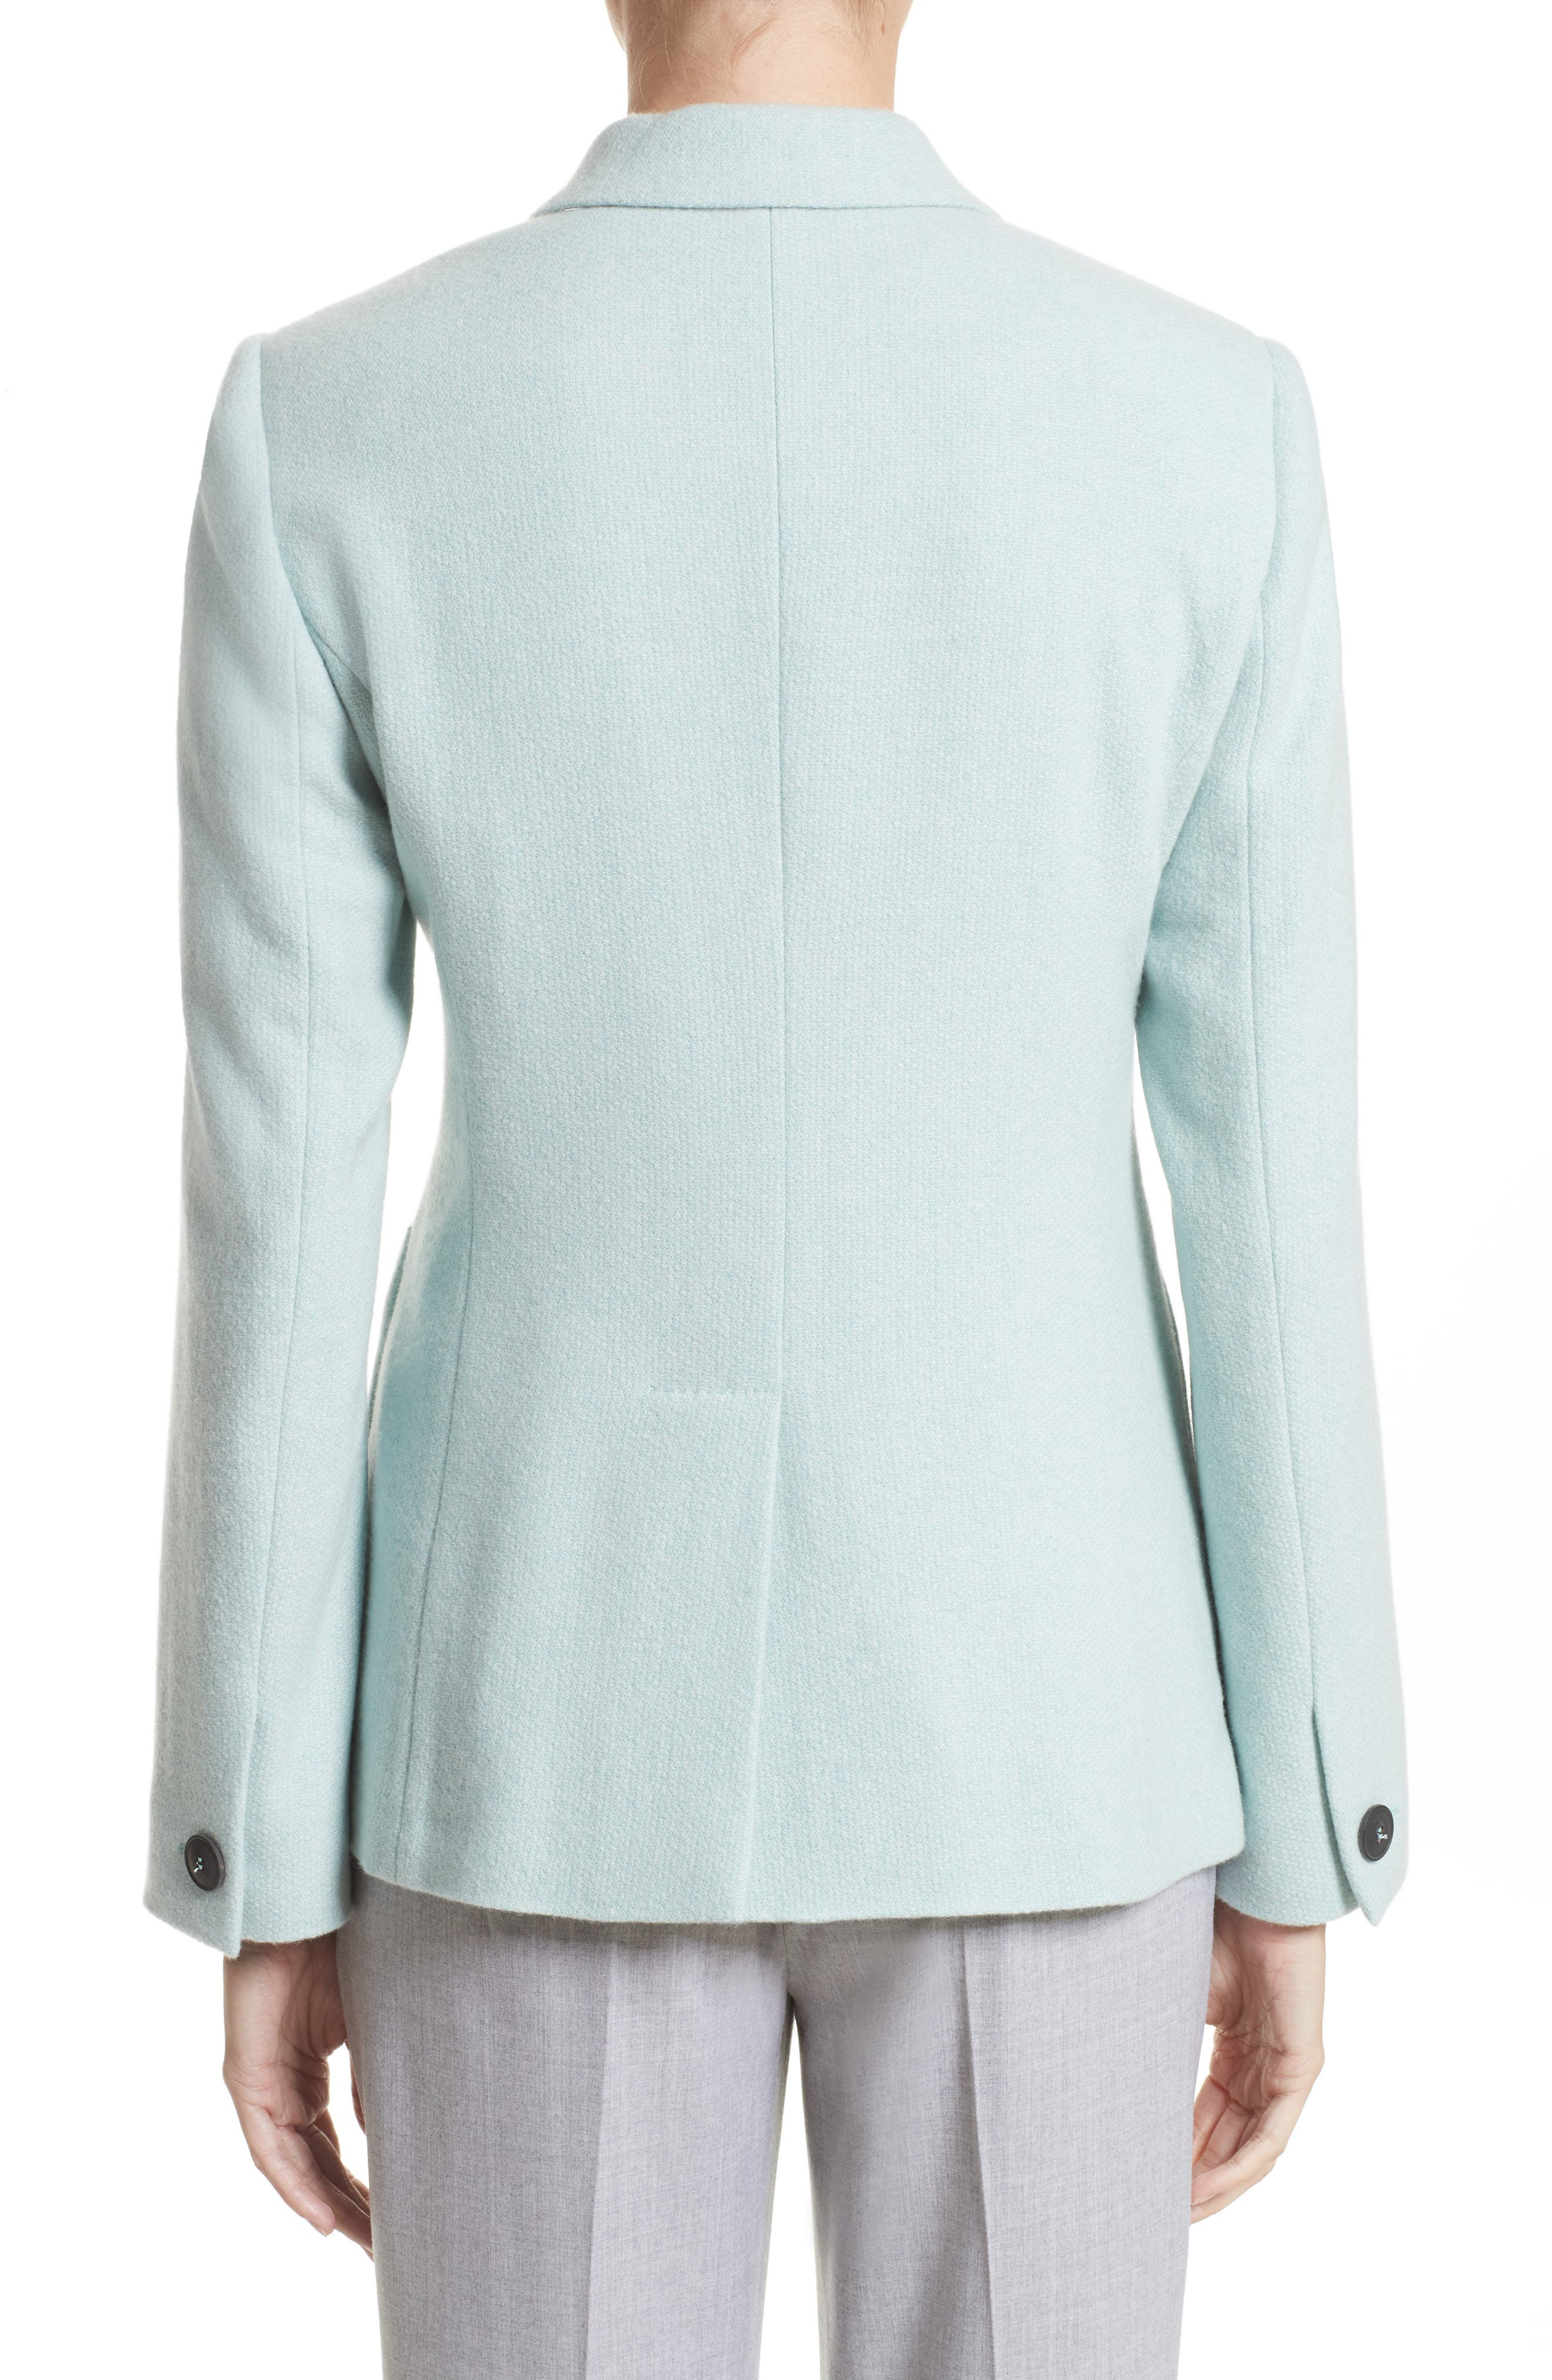 Pola Cashmere Jacket,                             Alternate thumbnail 2, color,                             401